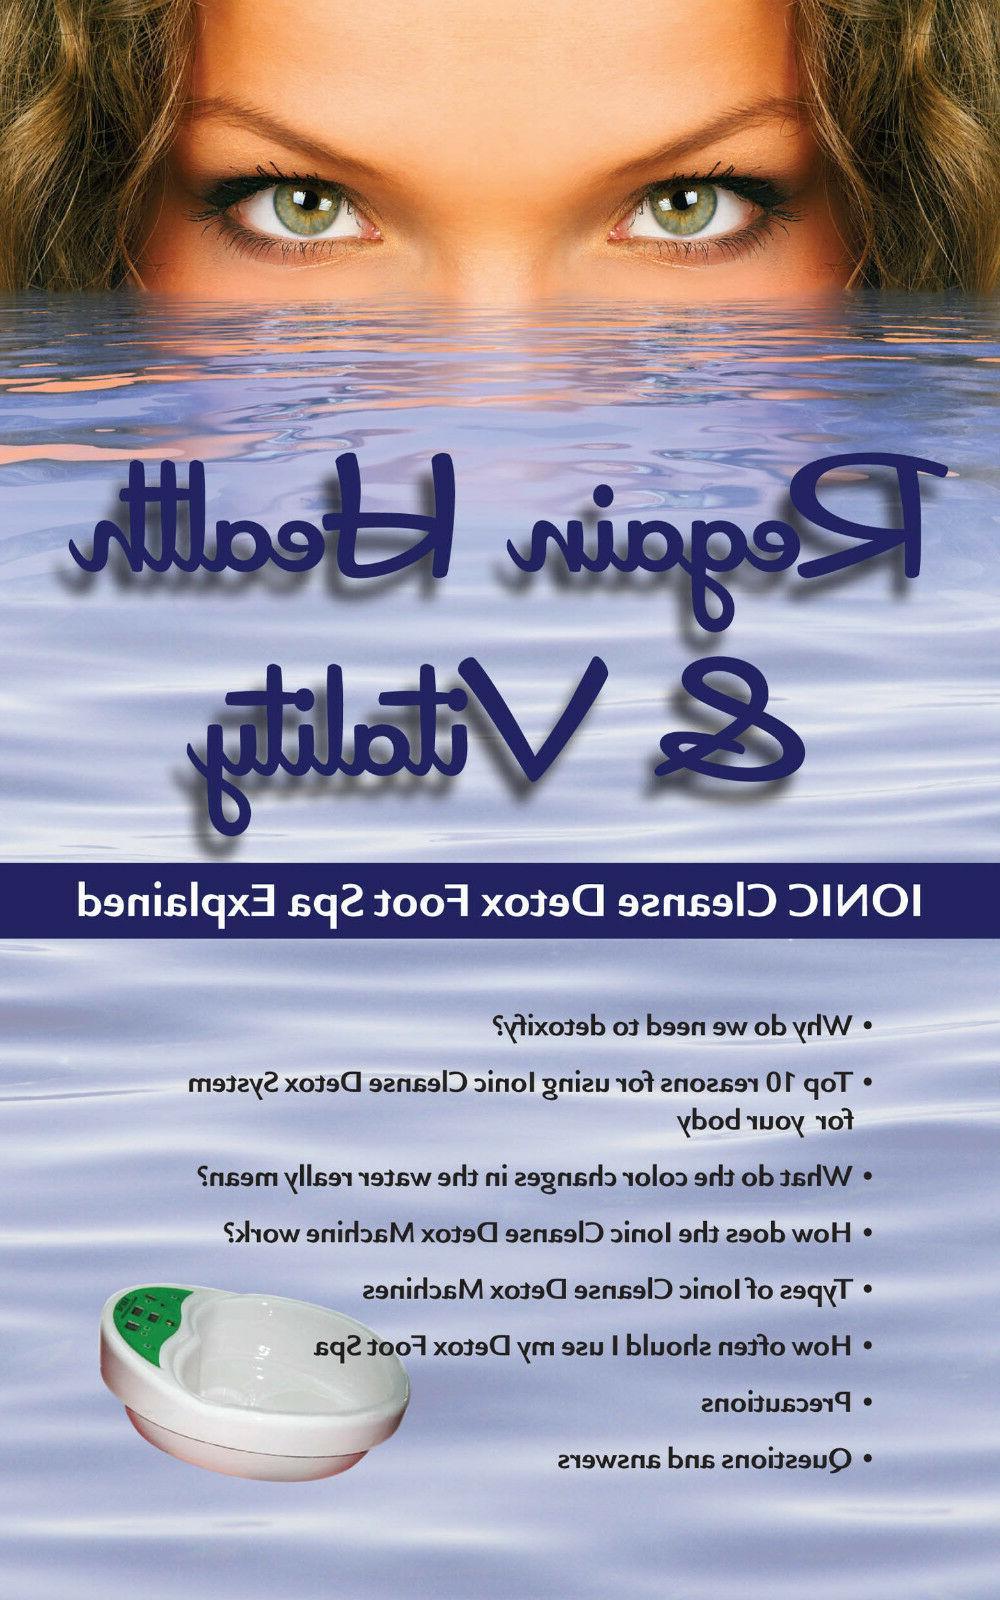 Ionic Spa Bath Cleanse, Portable Unit.